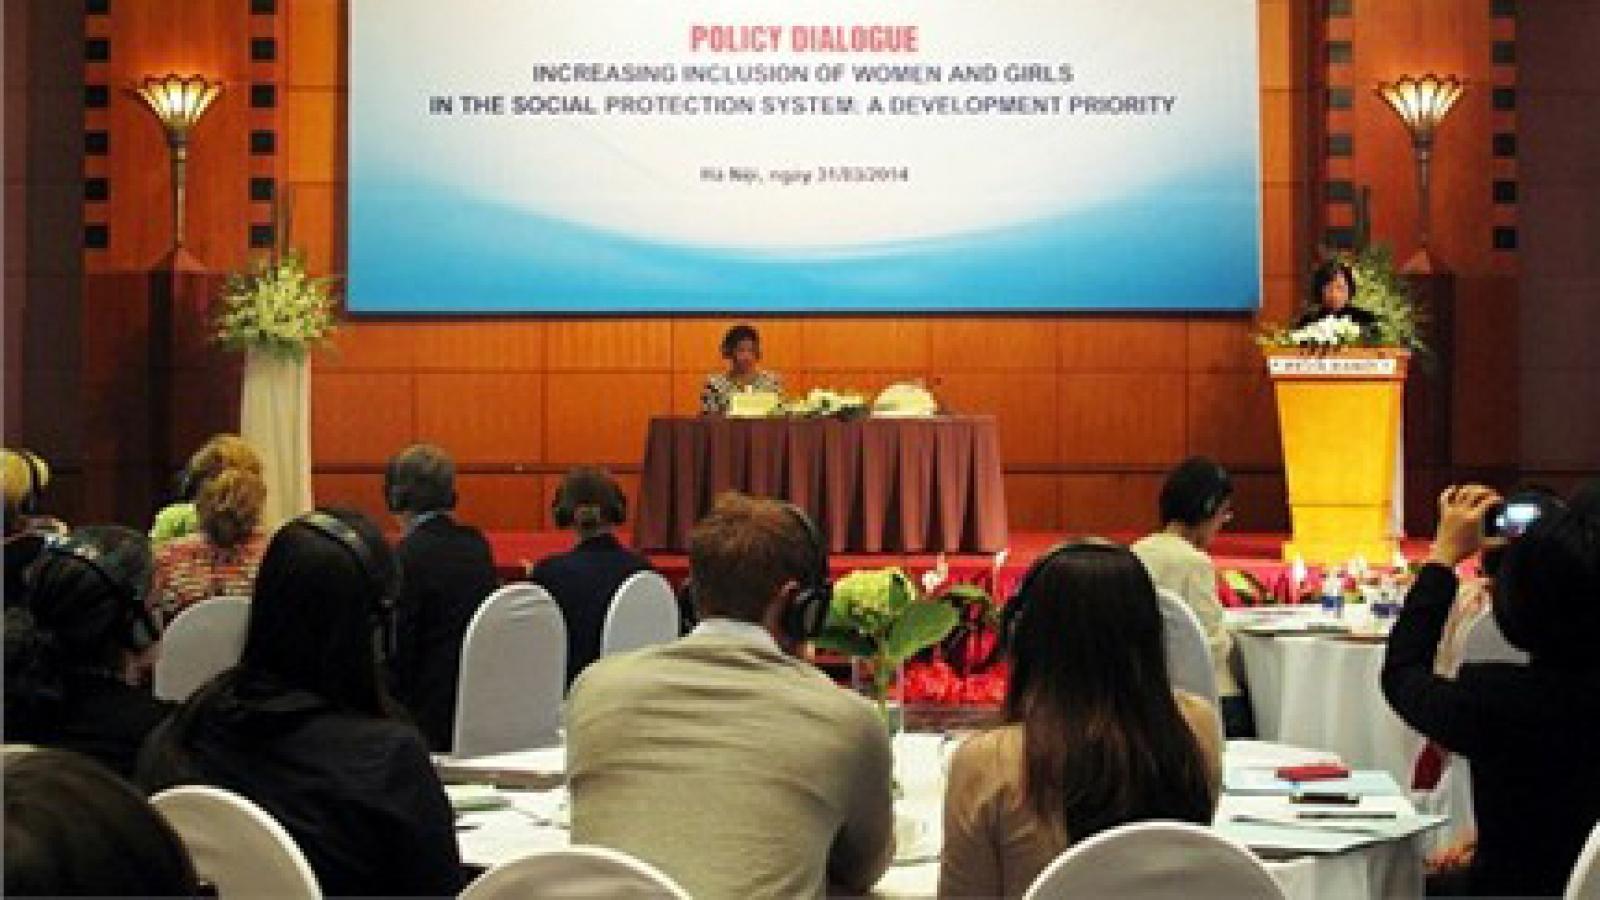 Hanoi casts the spotlight on gender inequality